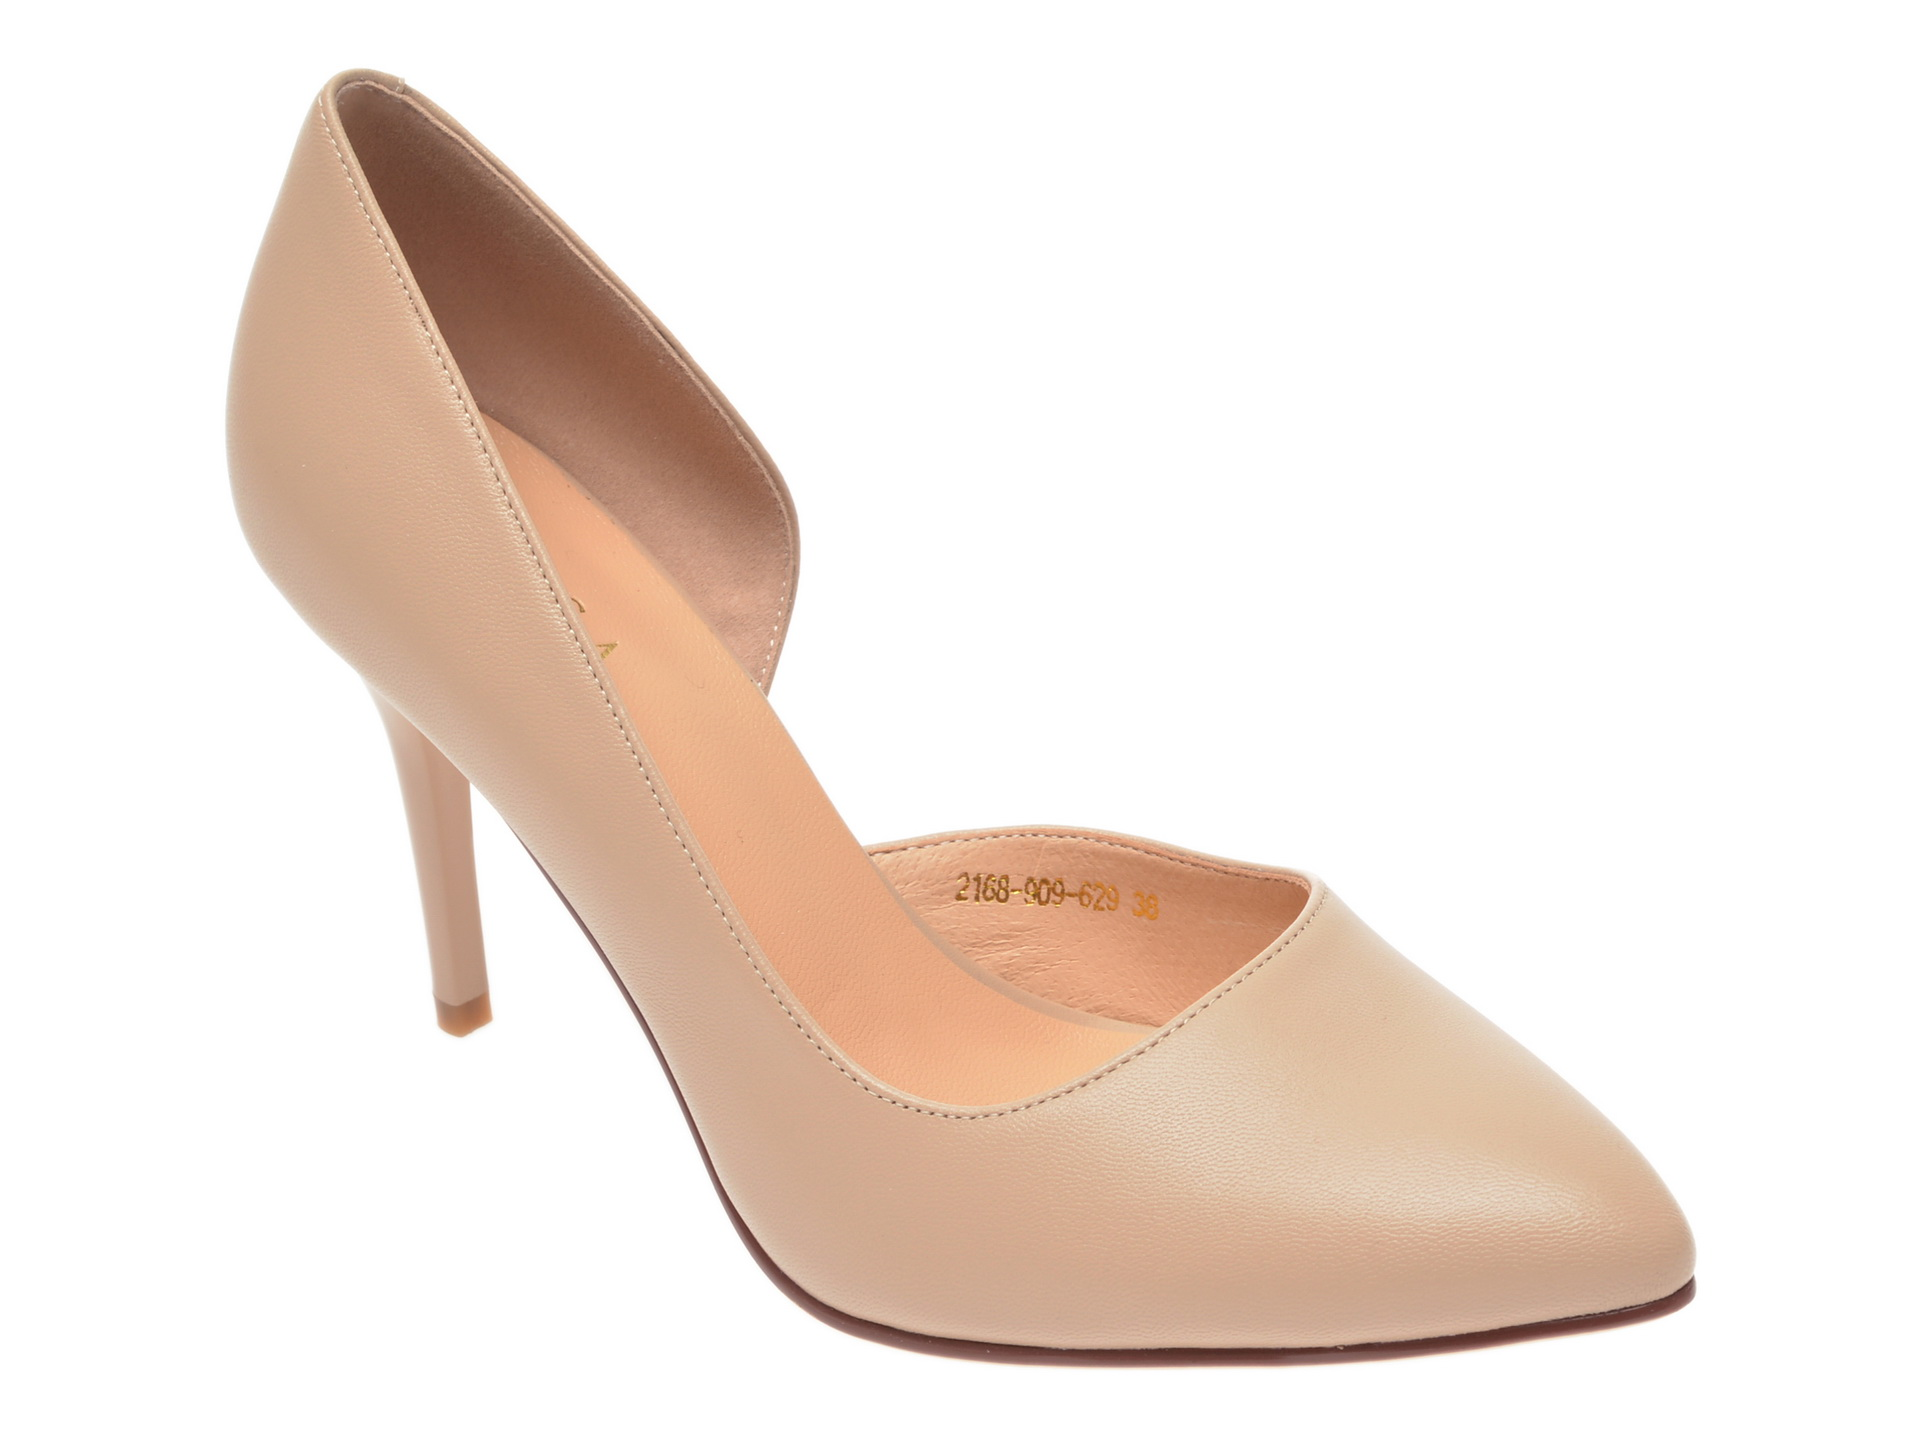 Pantofi EPICA bej, 2168909, din piele naturala